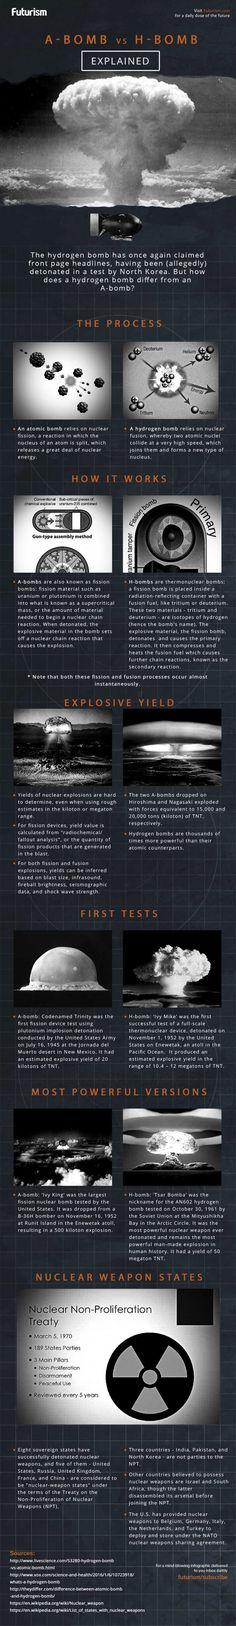 Nuclear bombs:  A-BOMB v H-BOMB